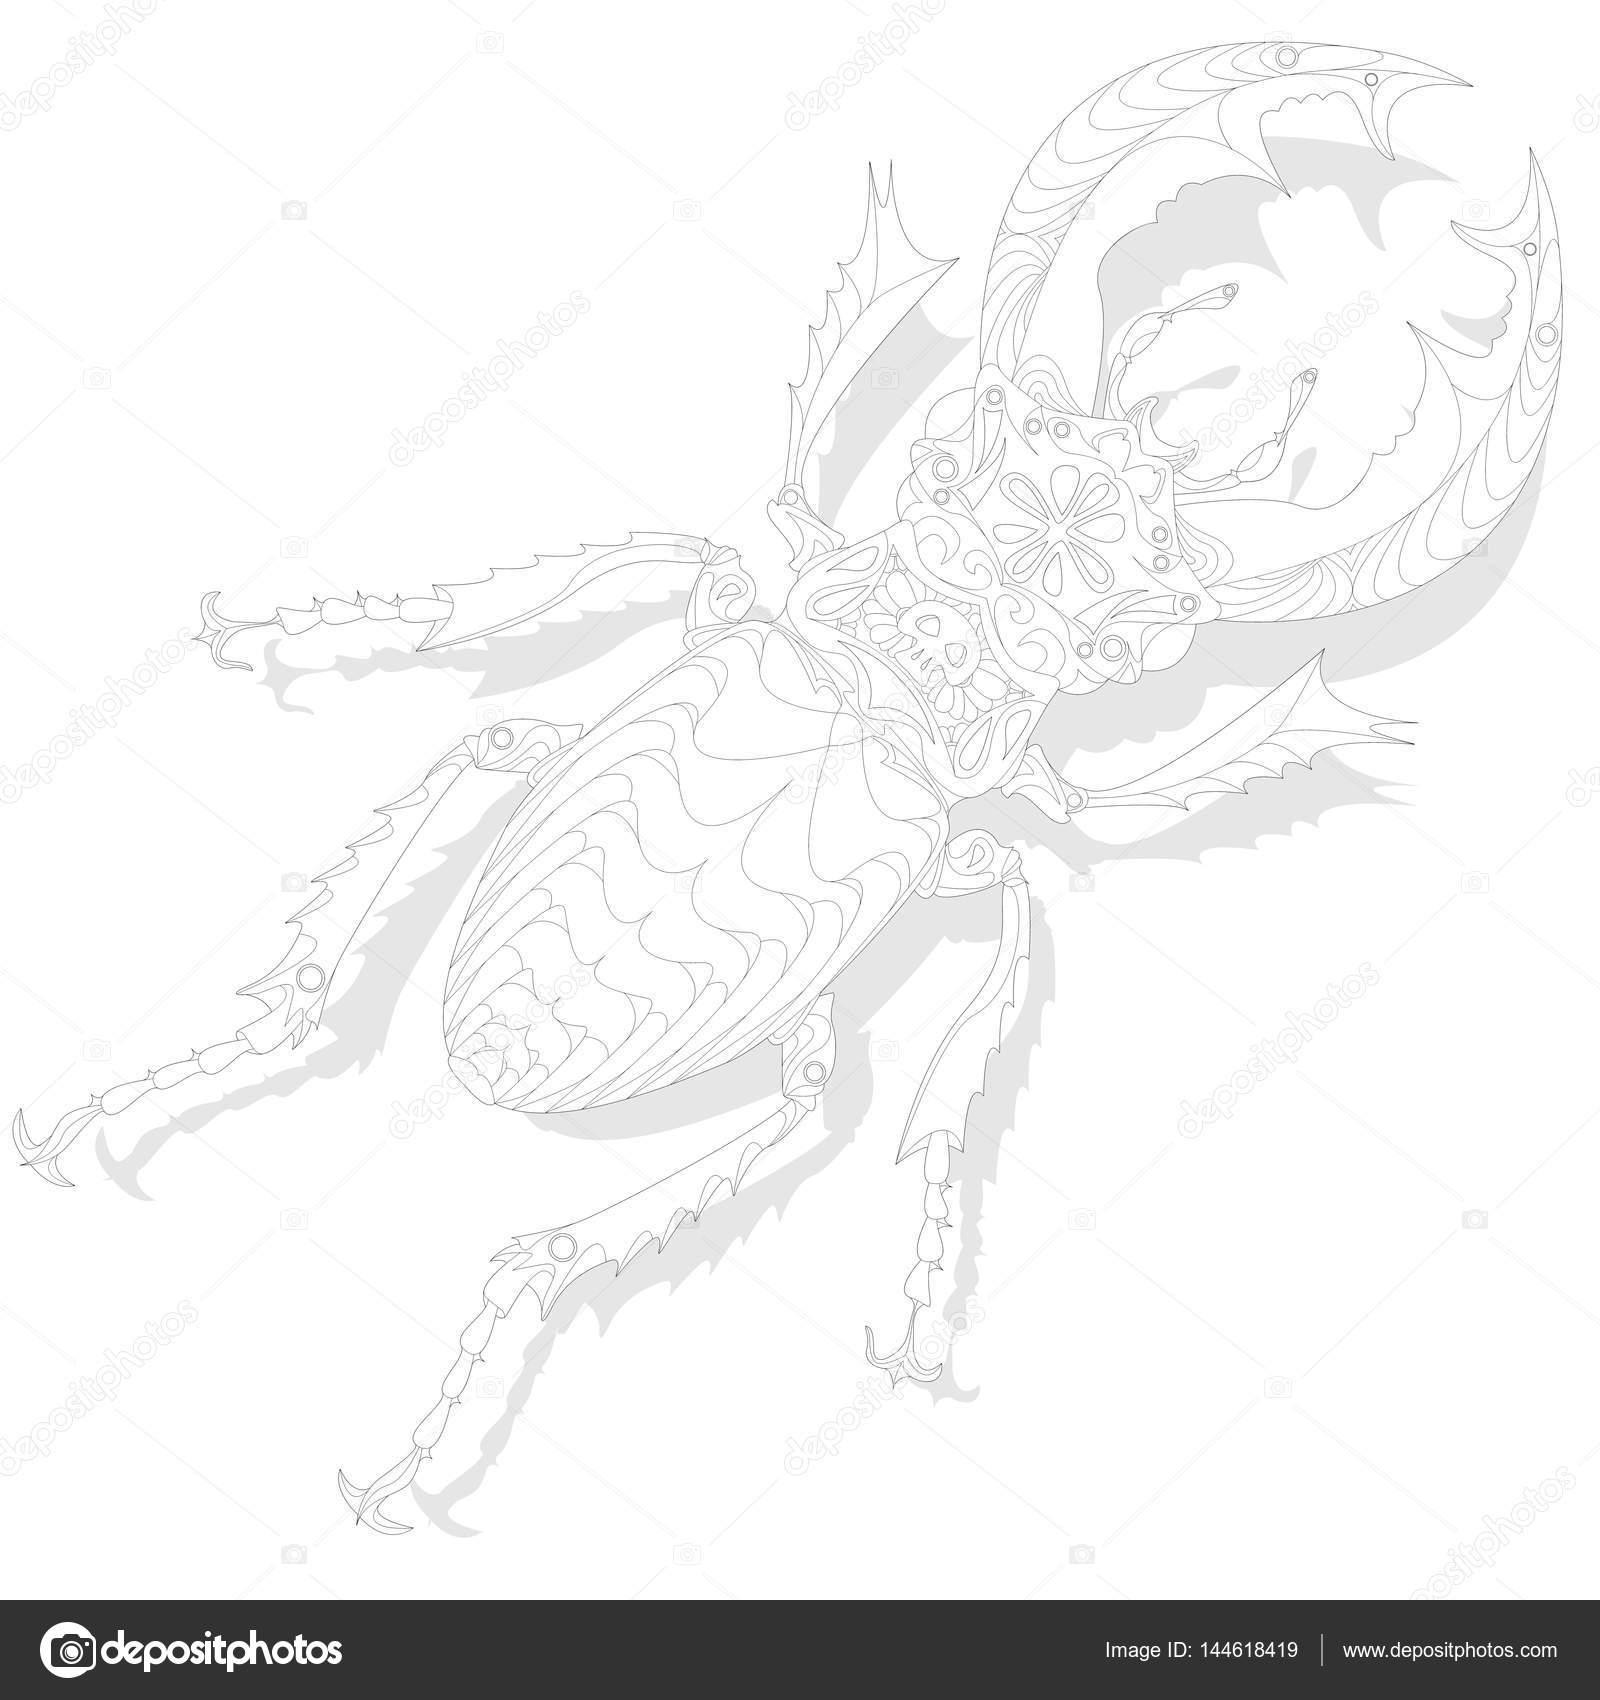 Käfer. Hand gezeichnete Skizze — Stockvektor © alekseyk1975 #144618419